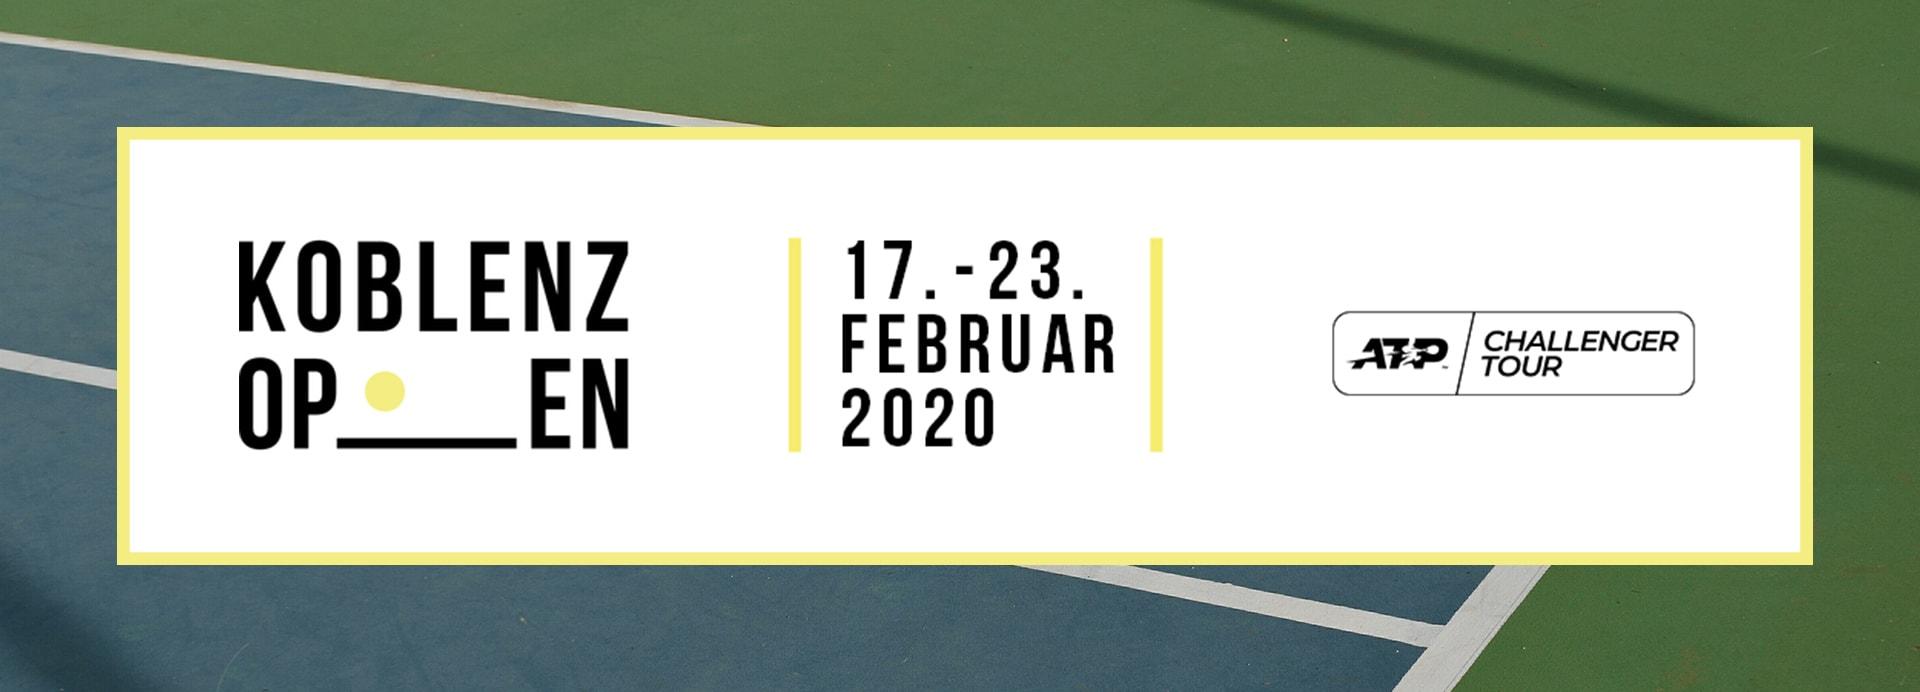 Koblenz Open 2020